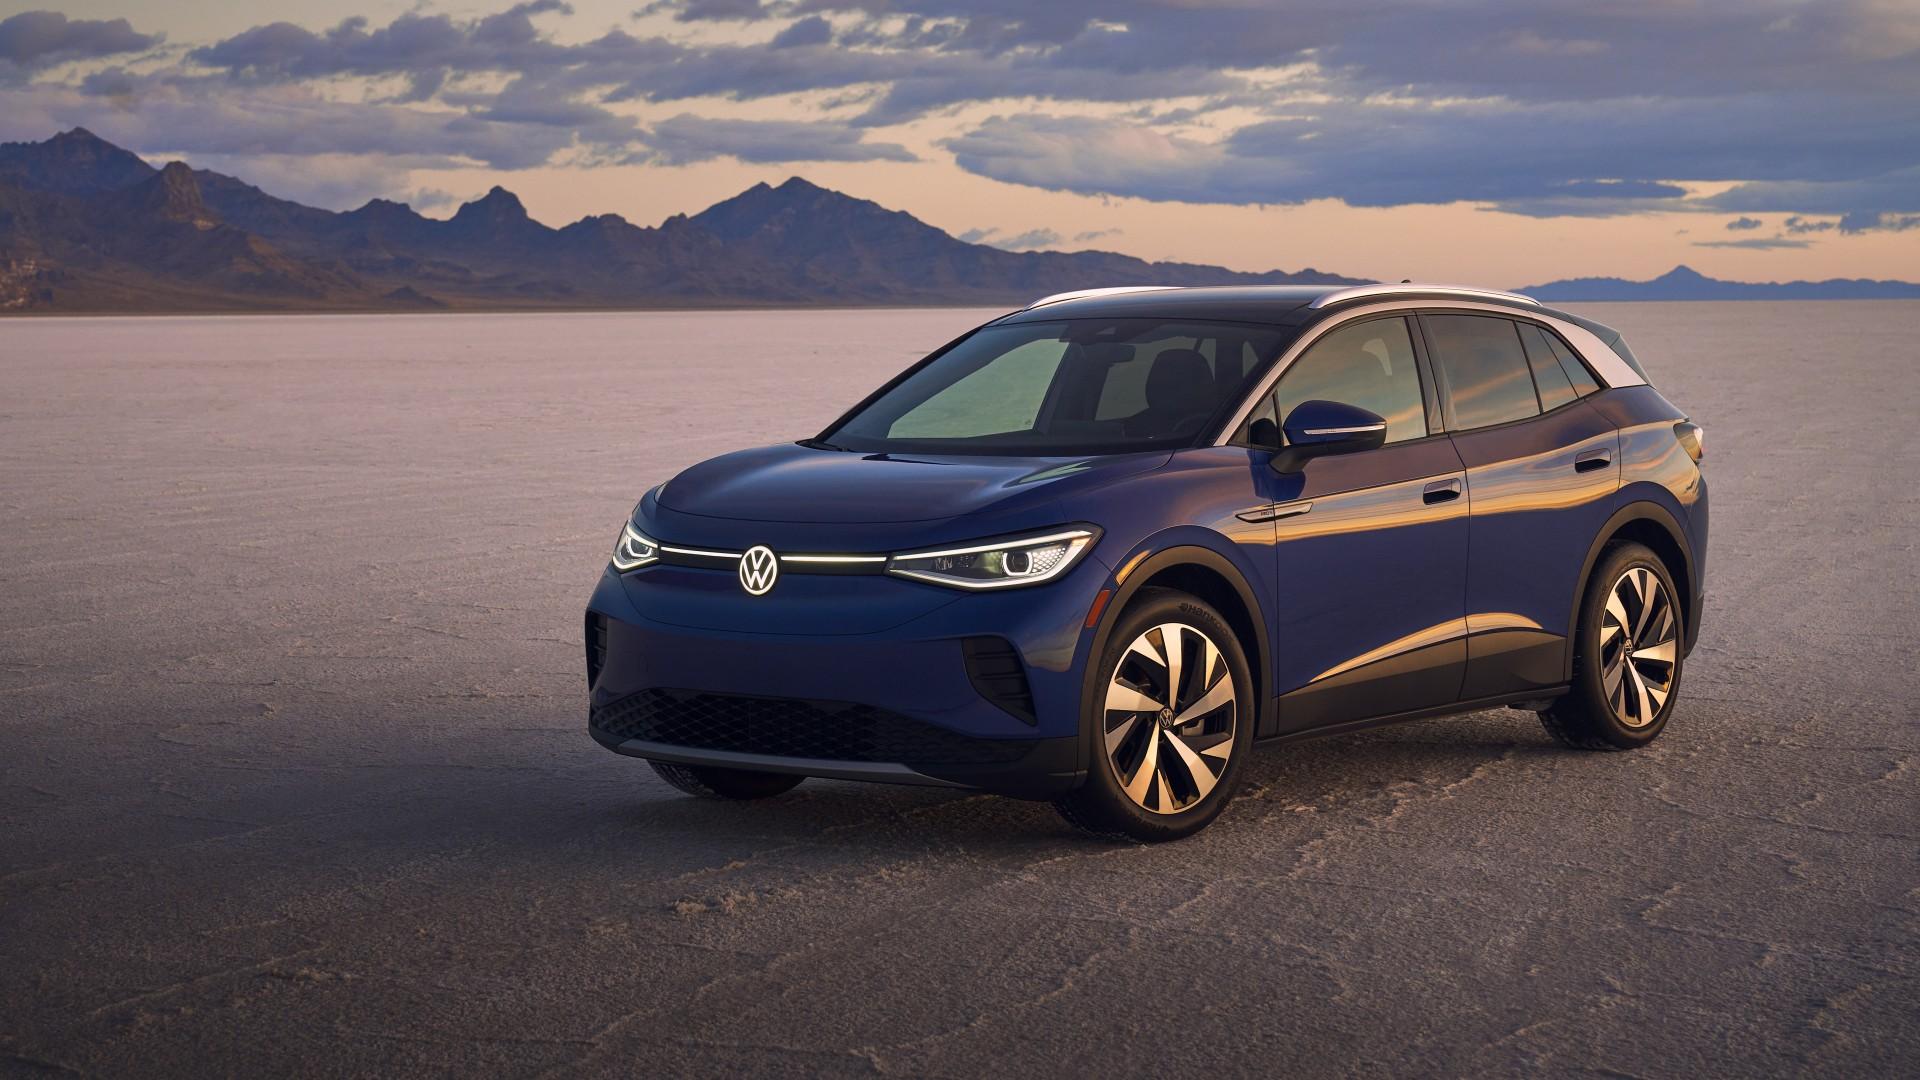 2021 Volkswagen ID.4 Pro S 4K Wallpaper | HD Car ...